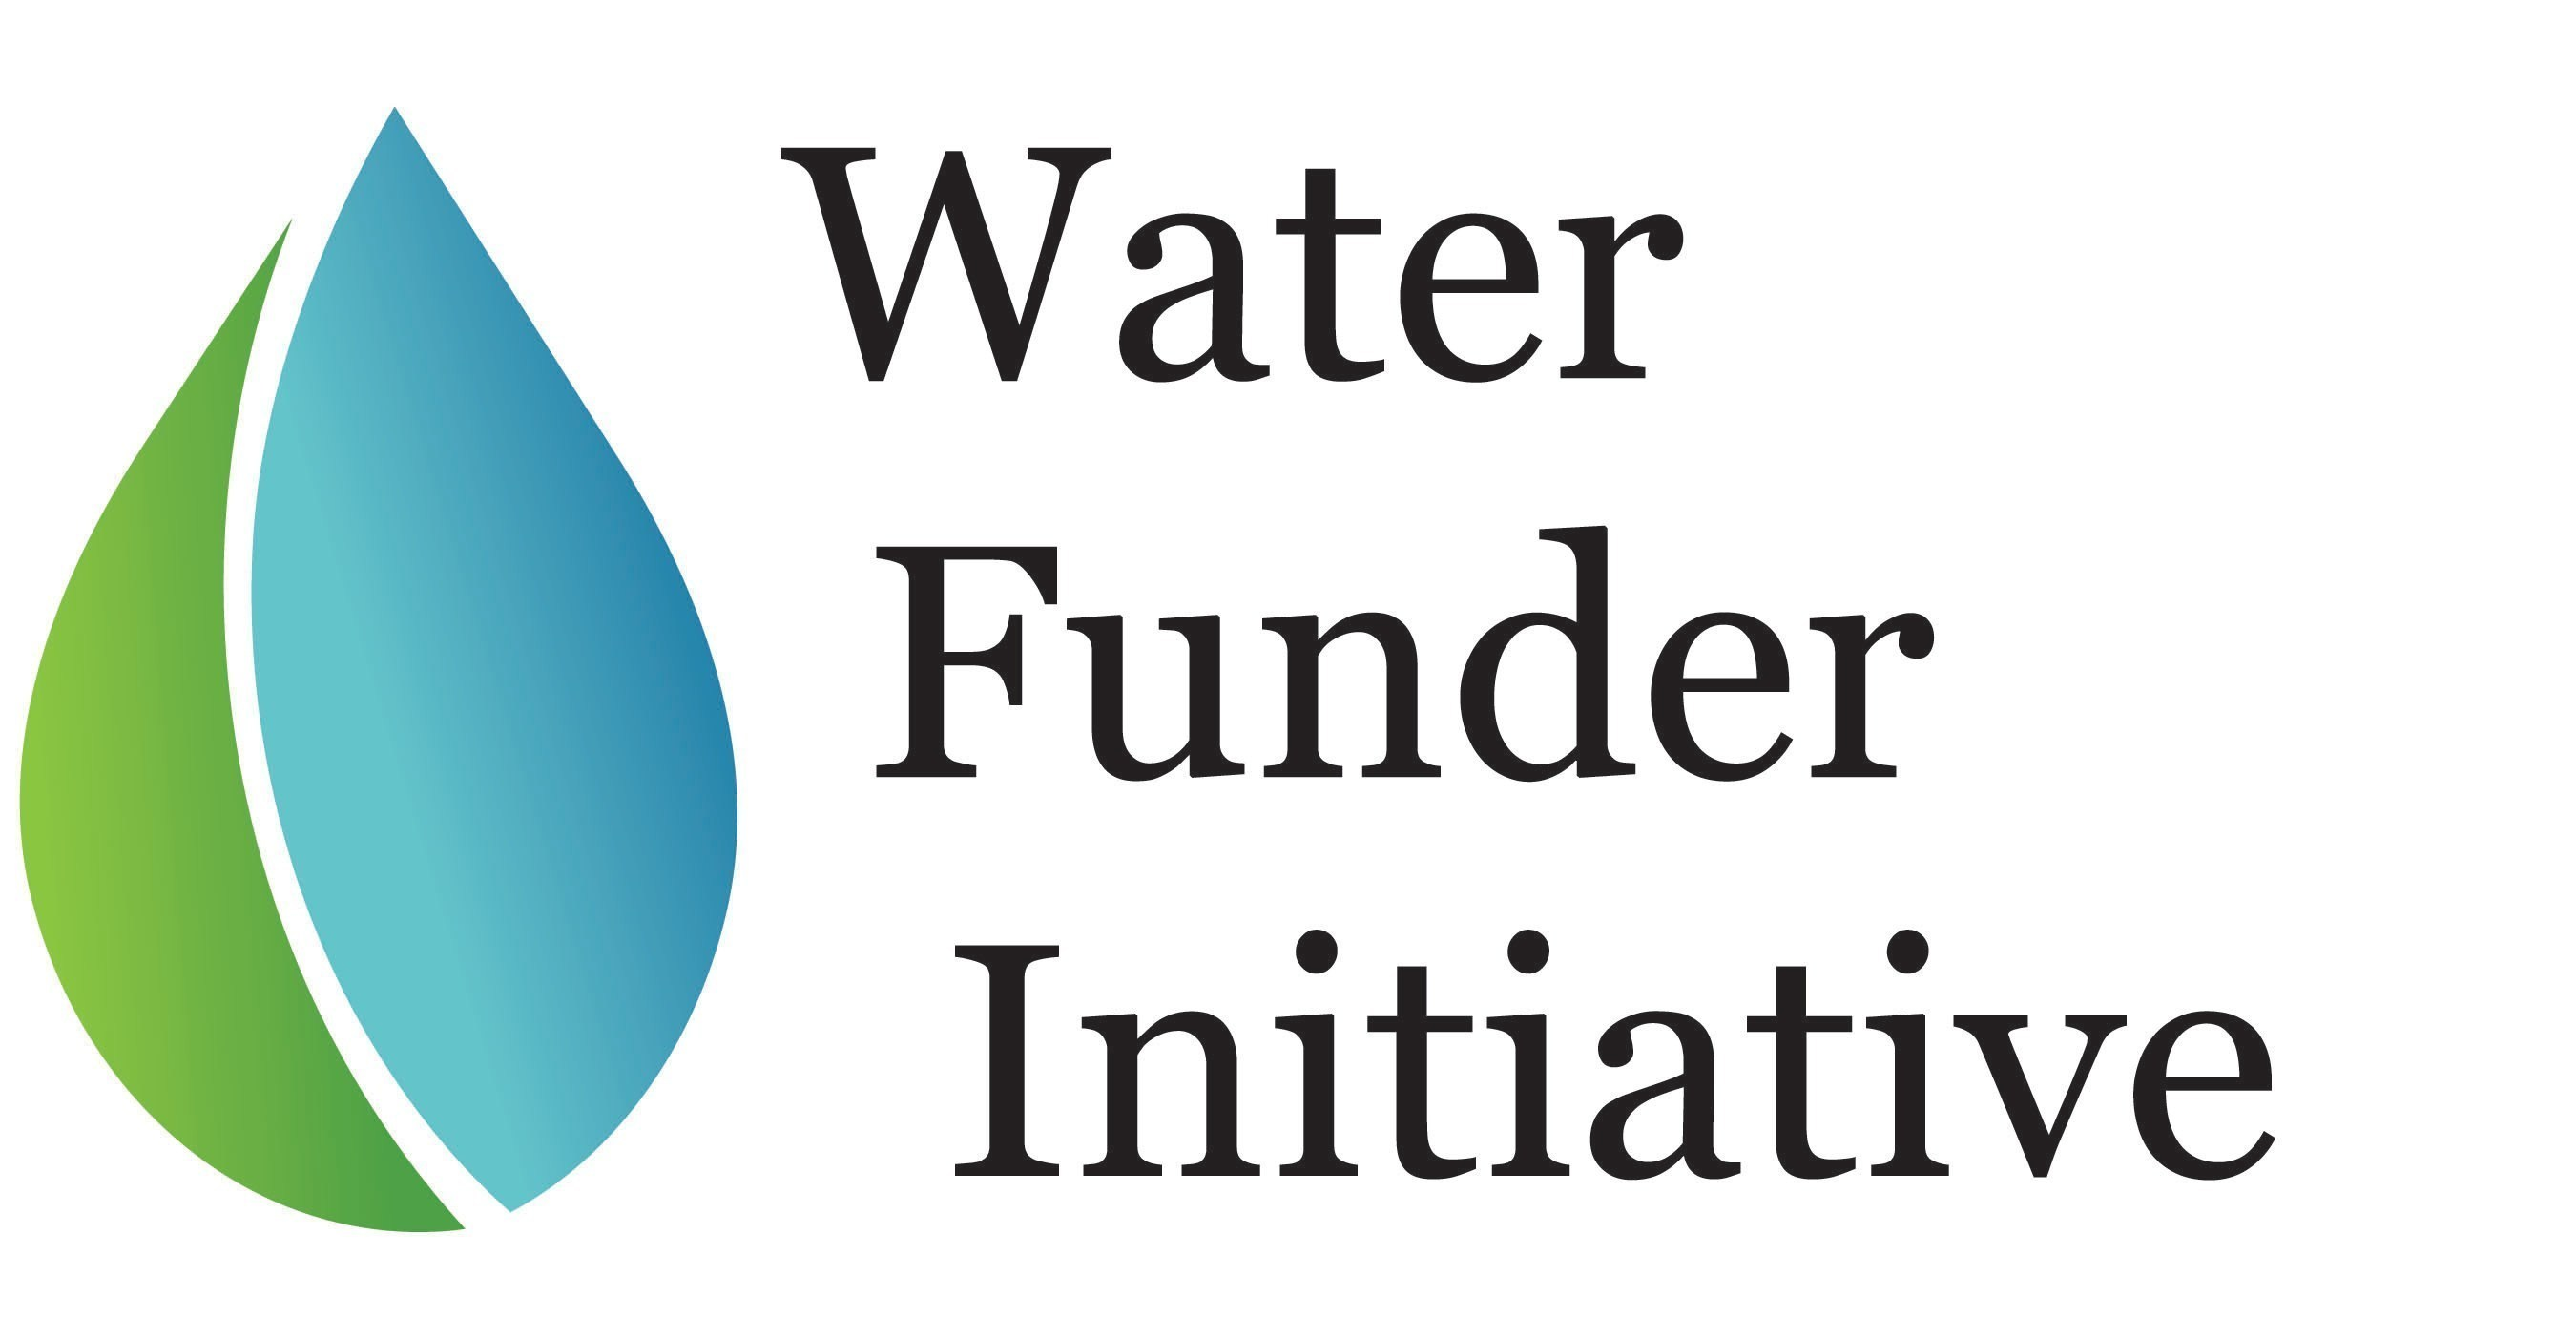 Water Funder Initiative